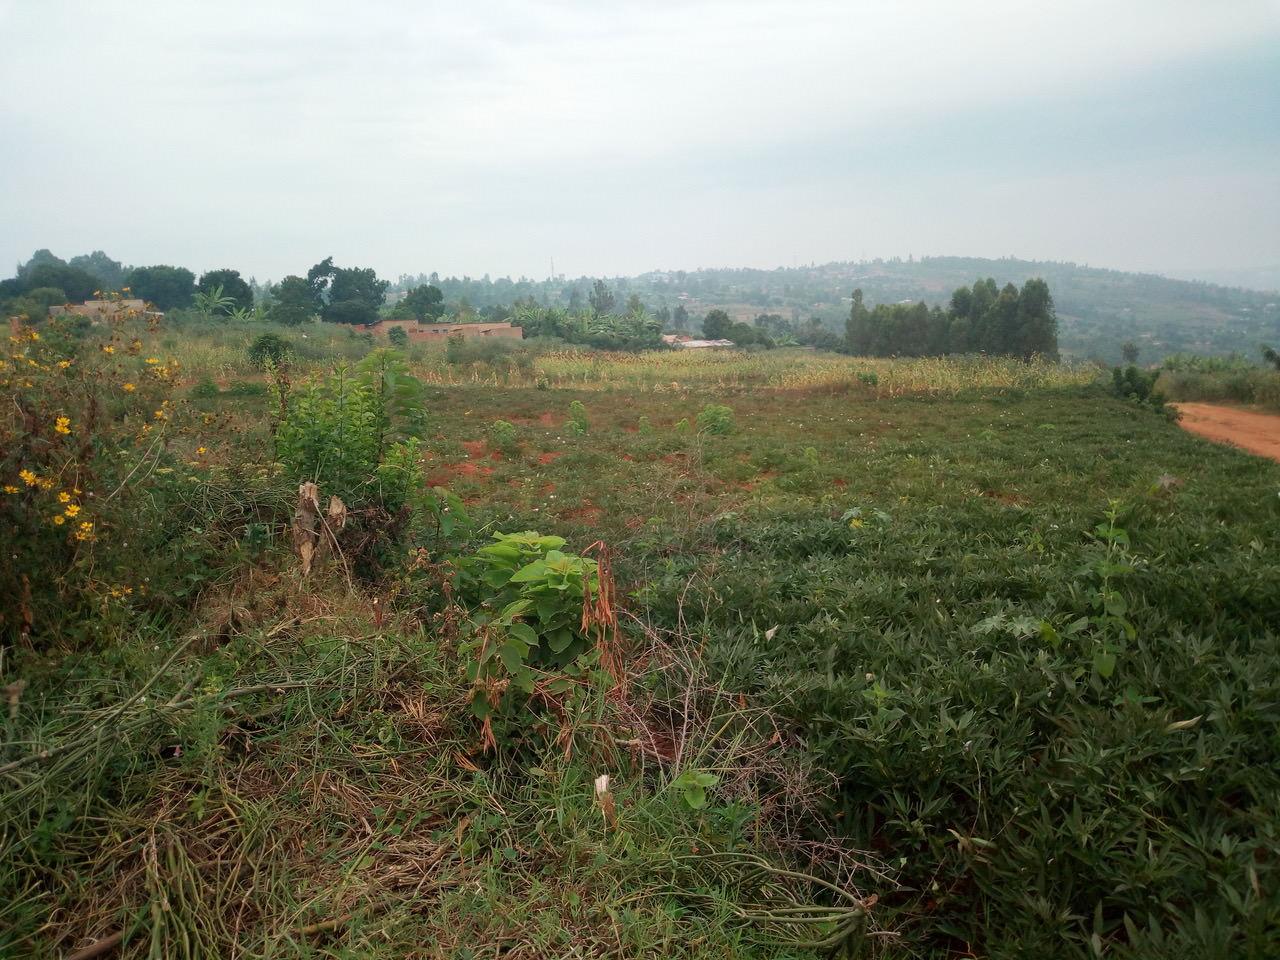 Purchased land in Rwanda